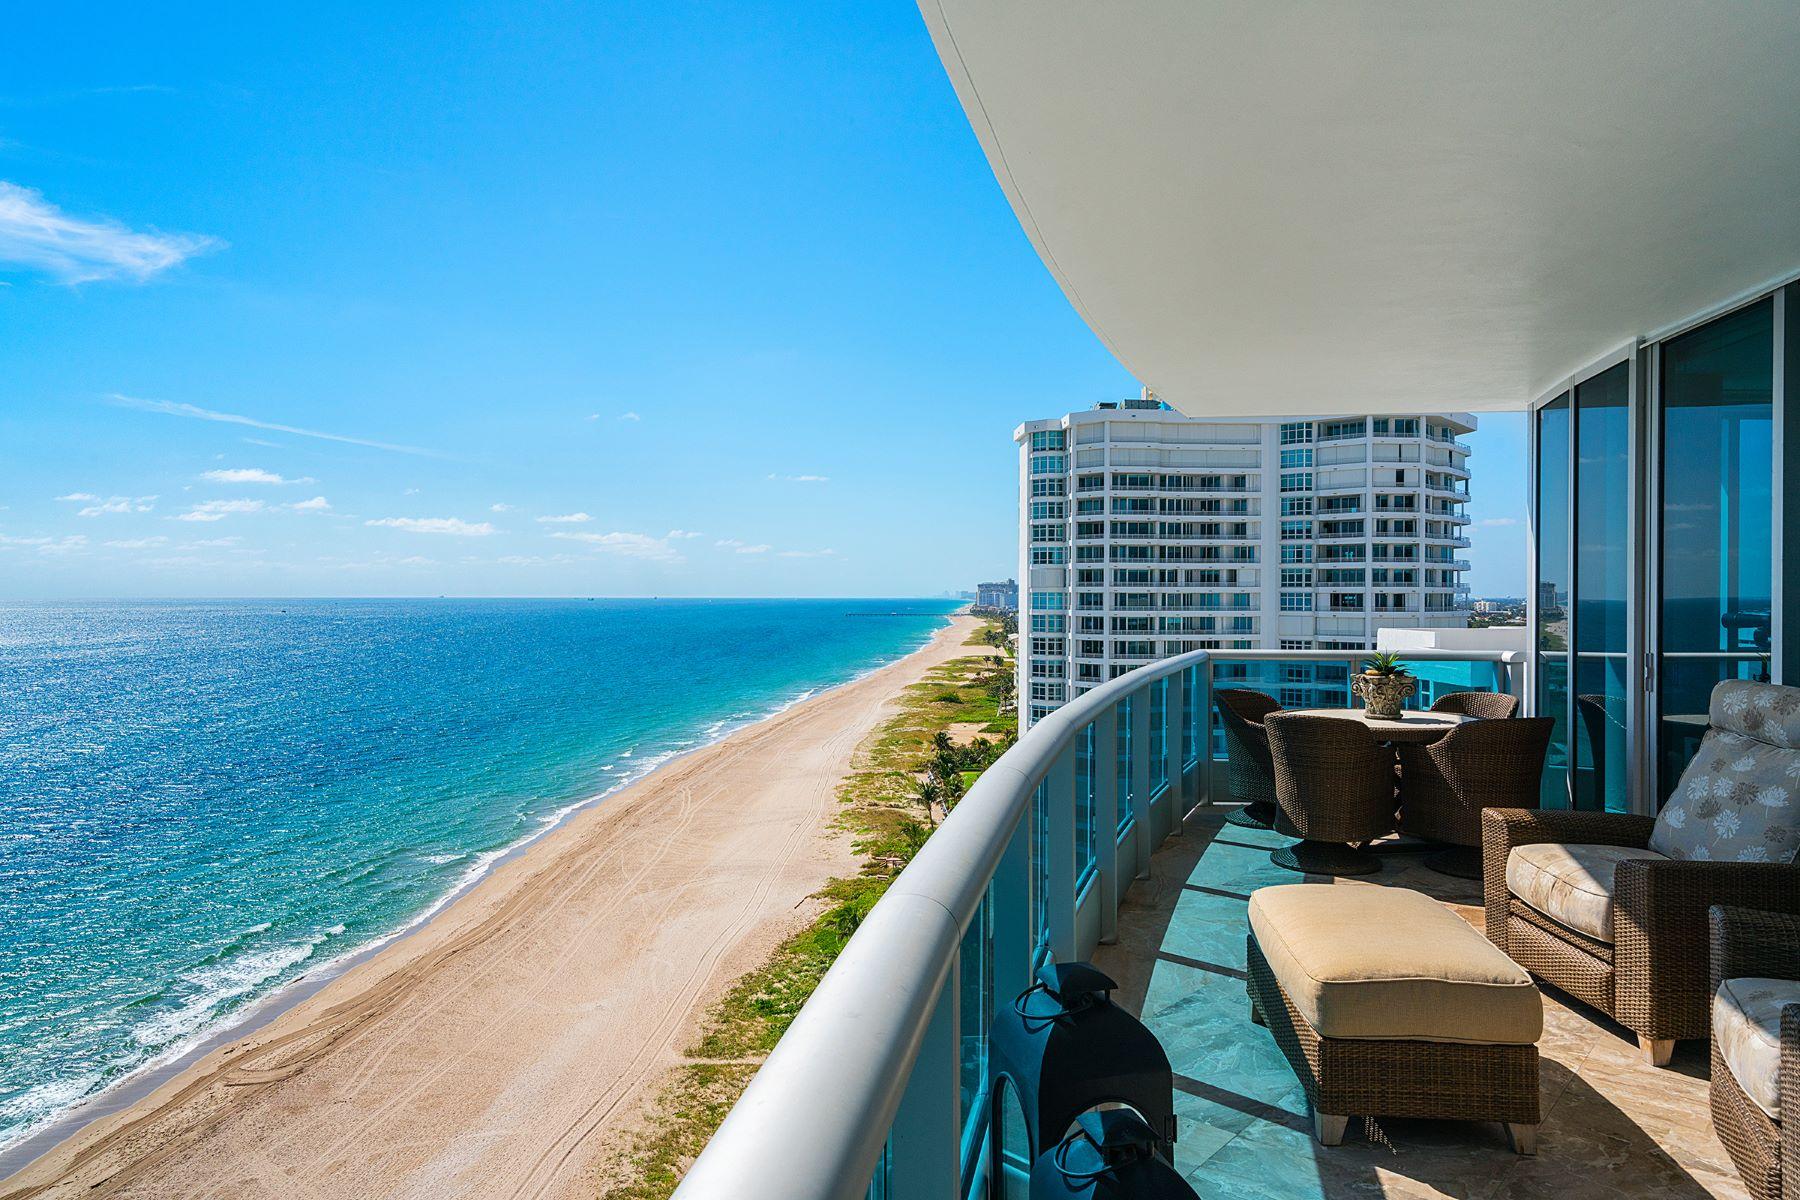 Nhà chung cư vì Bán tại 1600 S Ocean Blvd 1600 S Ocean Blvd 1501, Lauderdale By The Sea, Florida, 33062 Hoa Kỳ